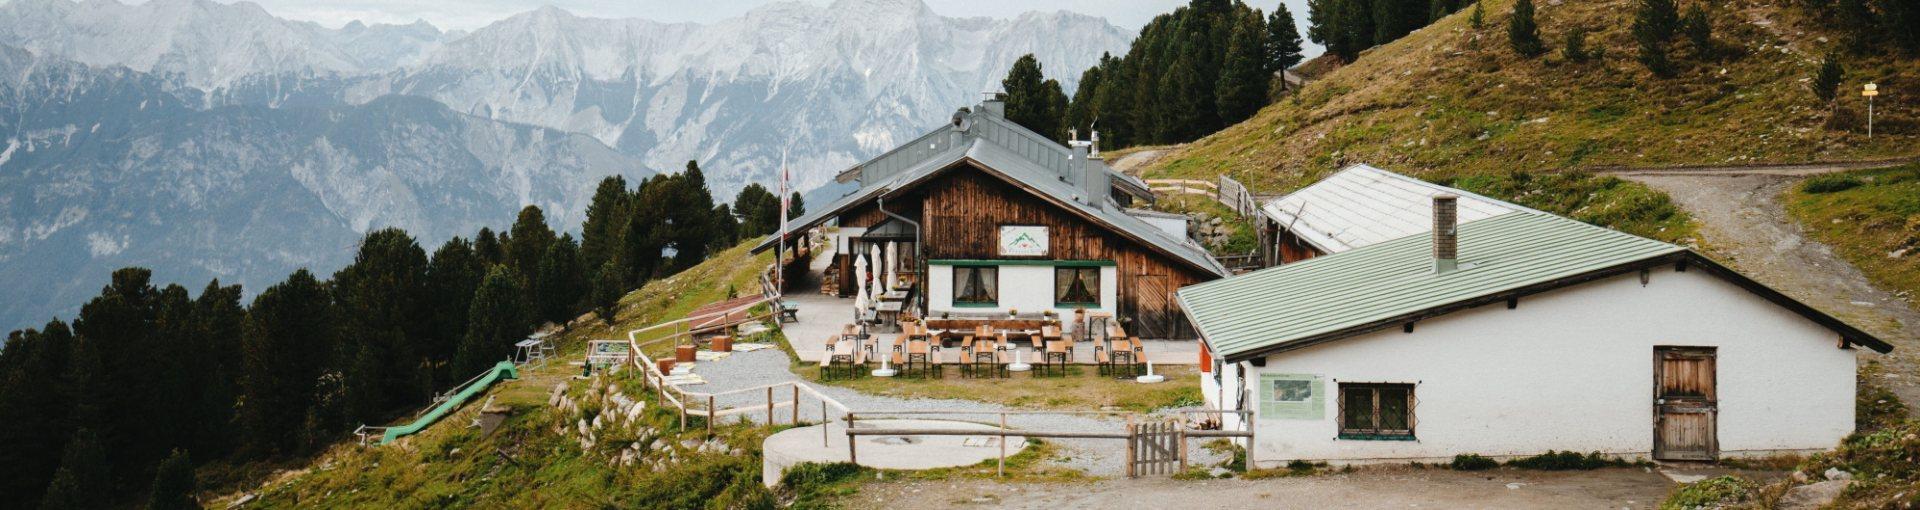 Tulfes, Inntaler Höhenweg, Tulfeinalm © Charly Schwarz